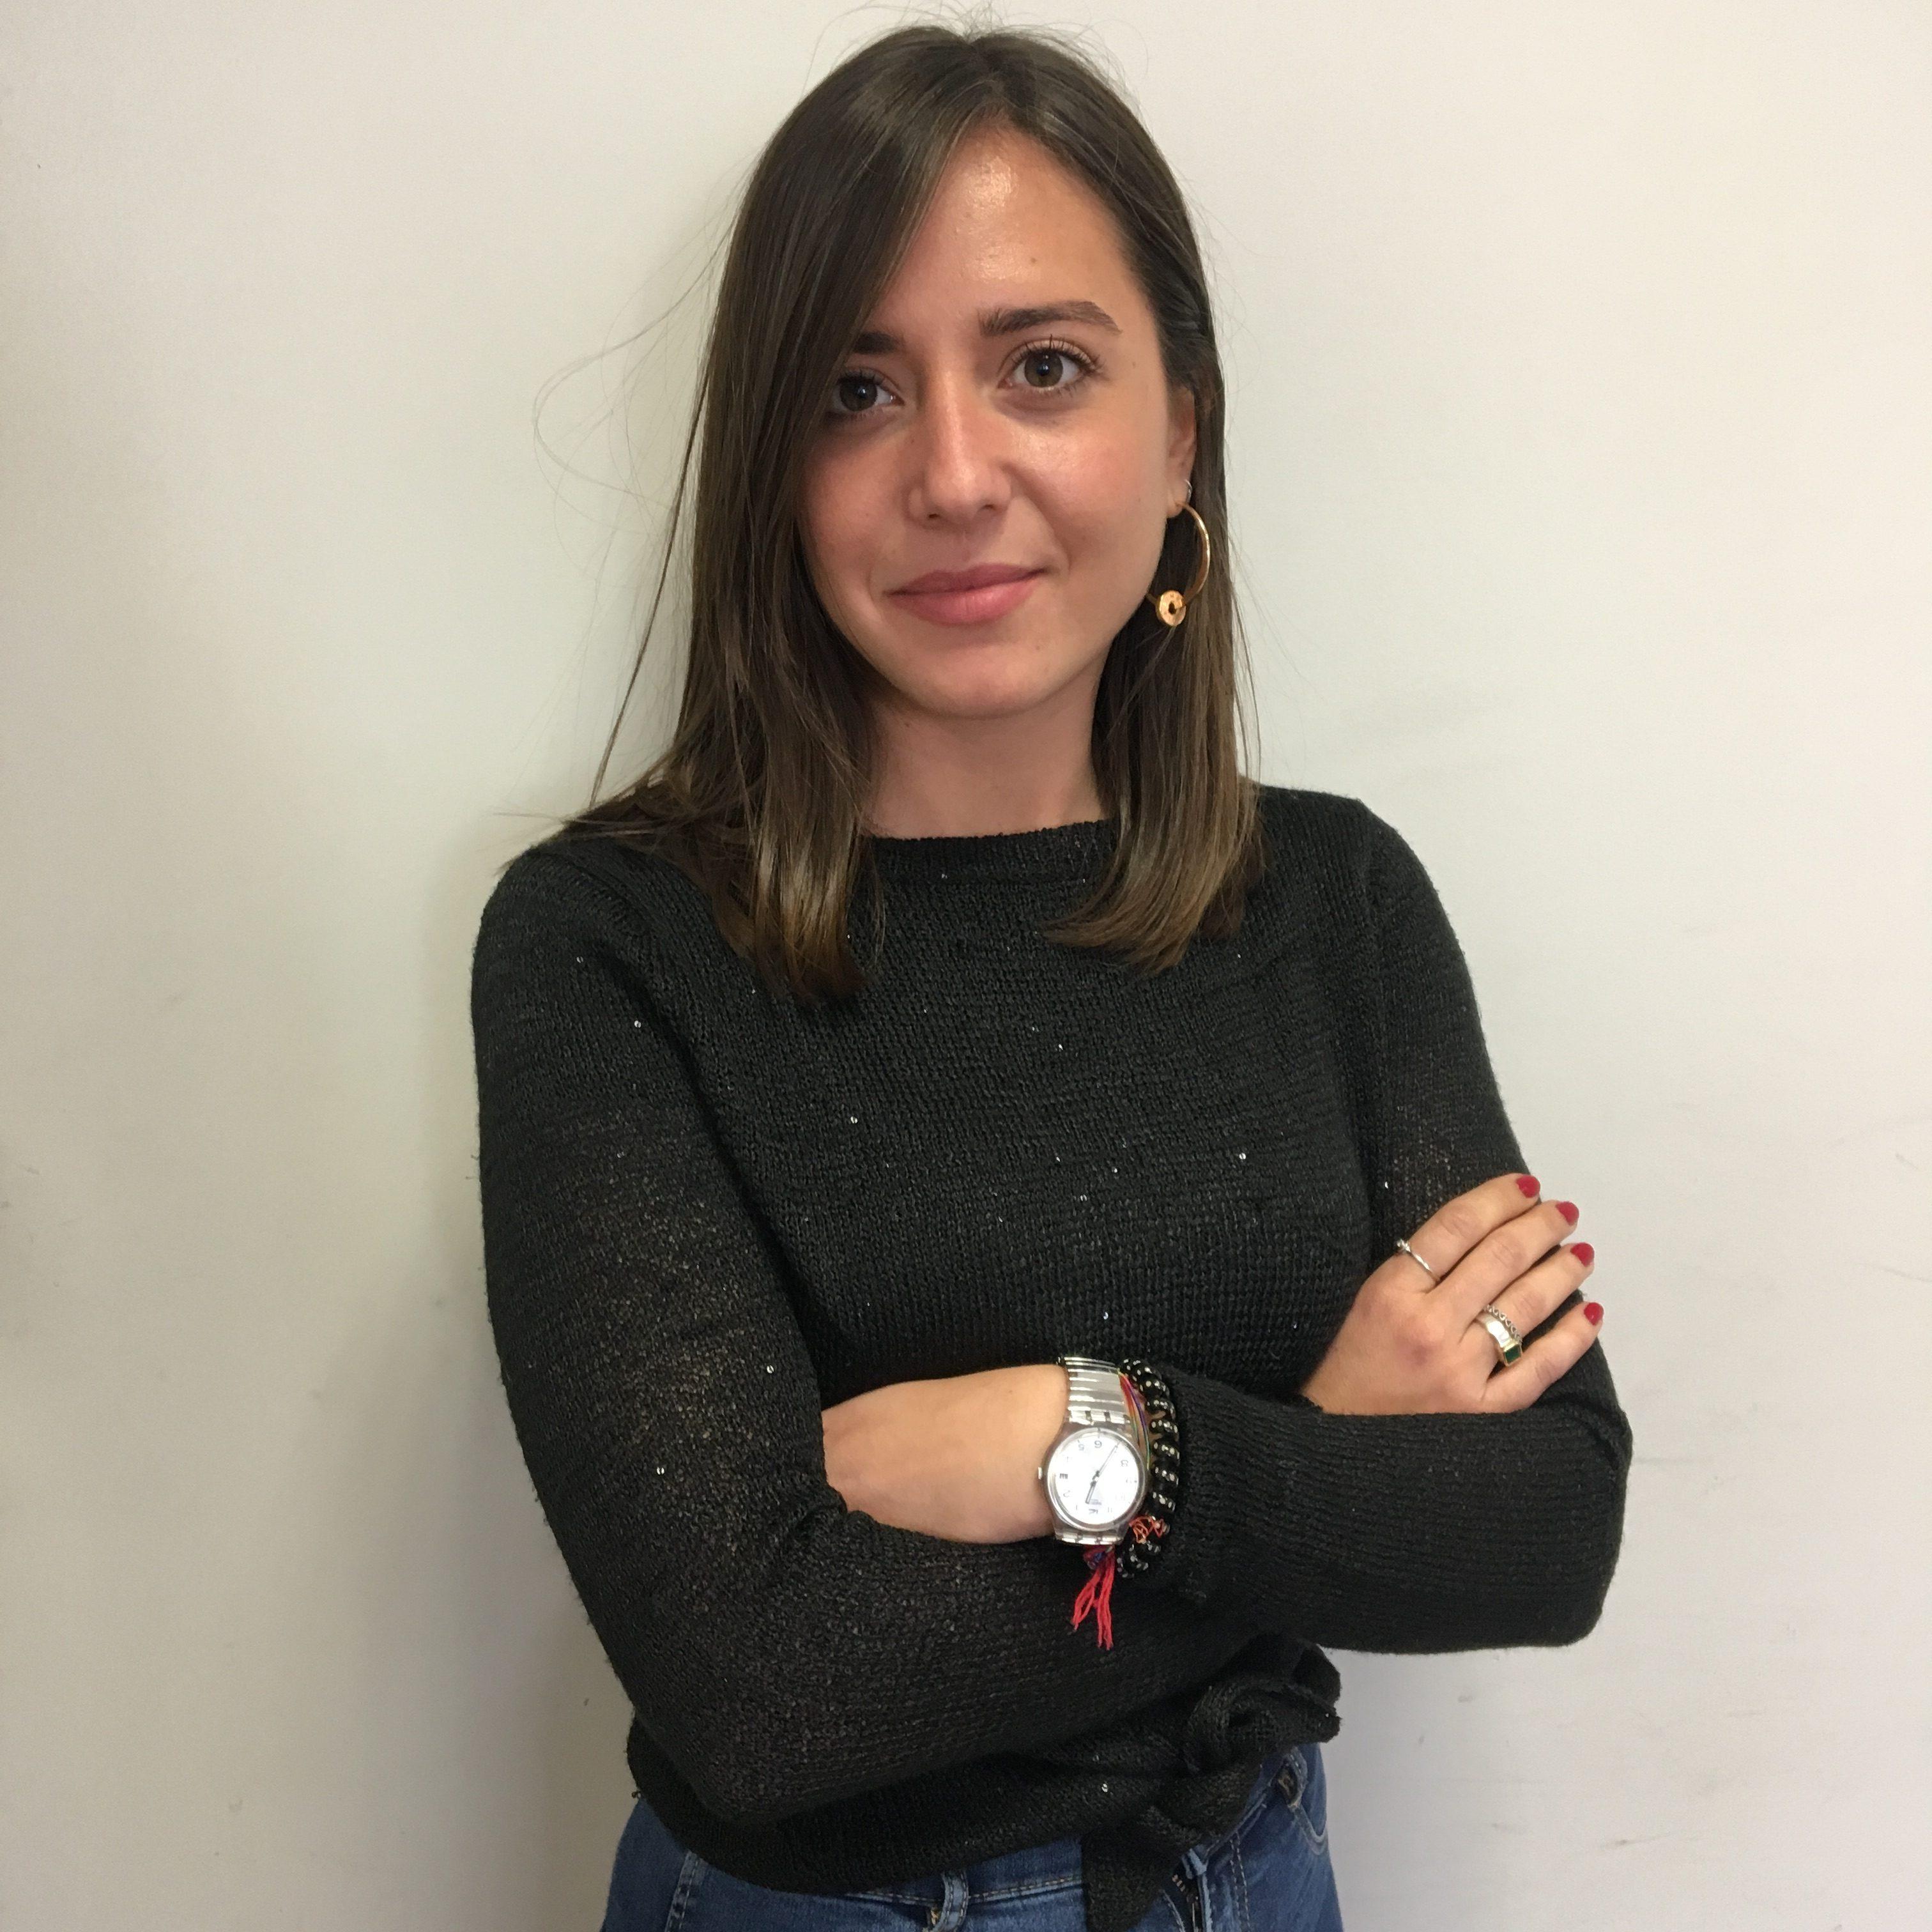 Luisa Peña